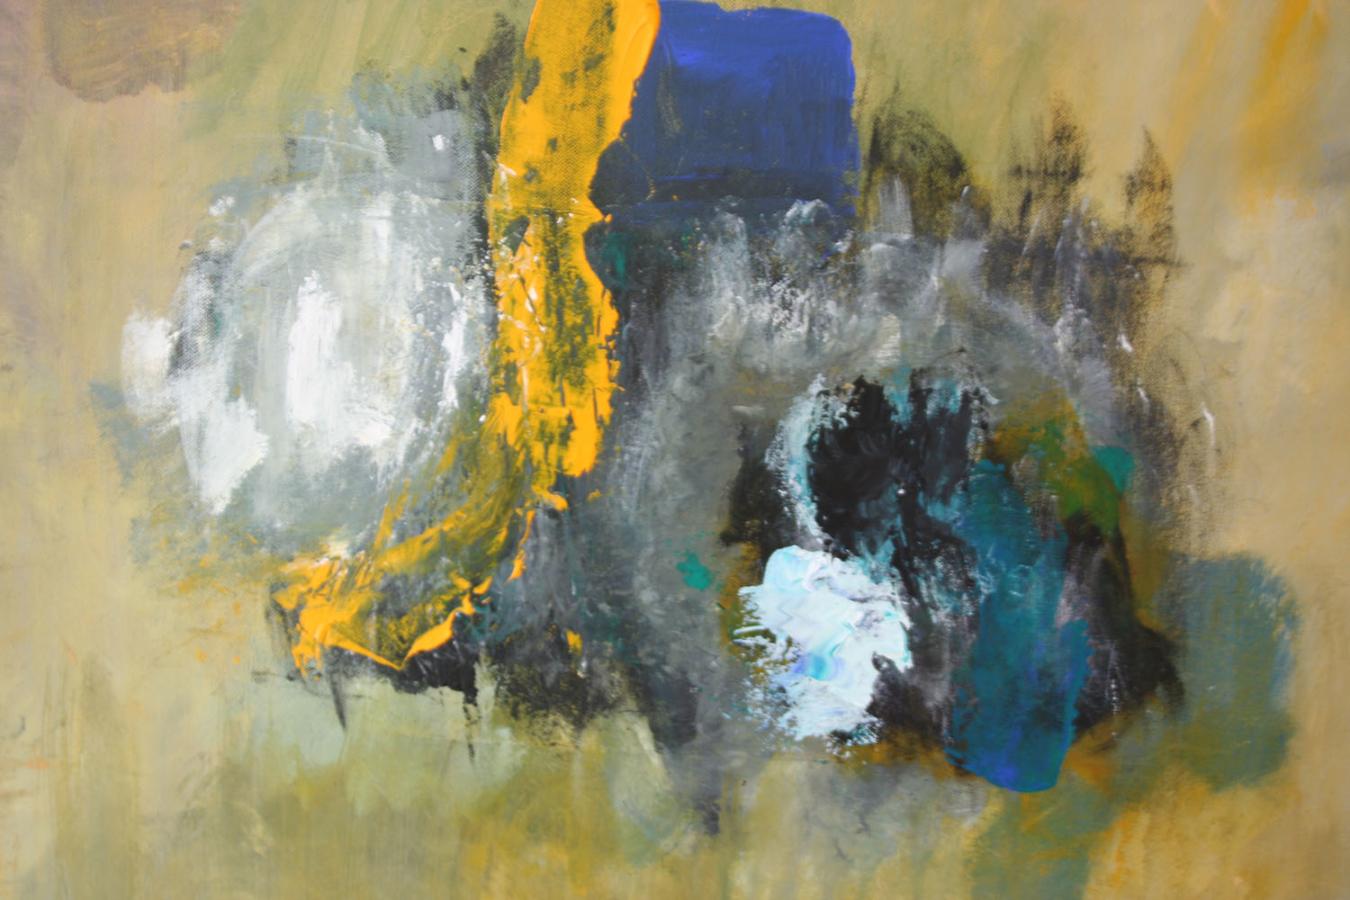 Kunstwerken en detail 007